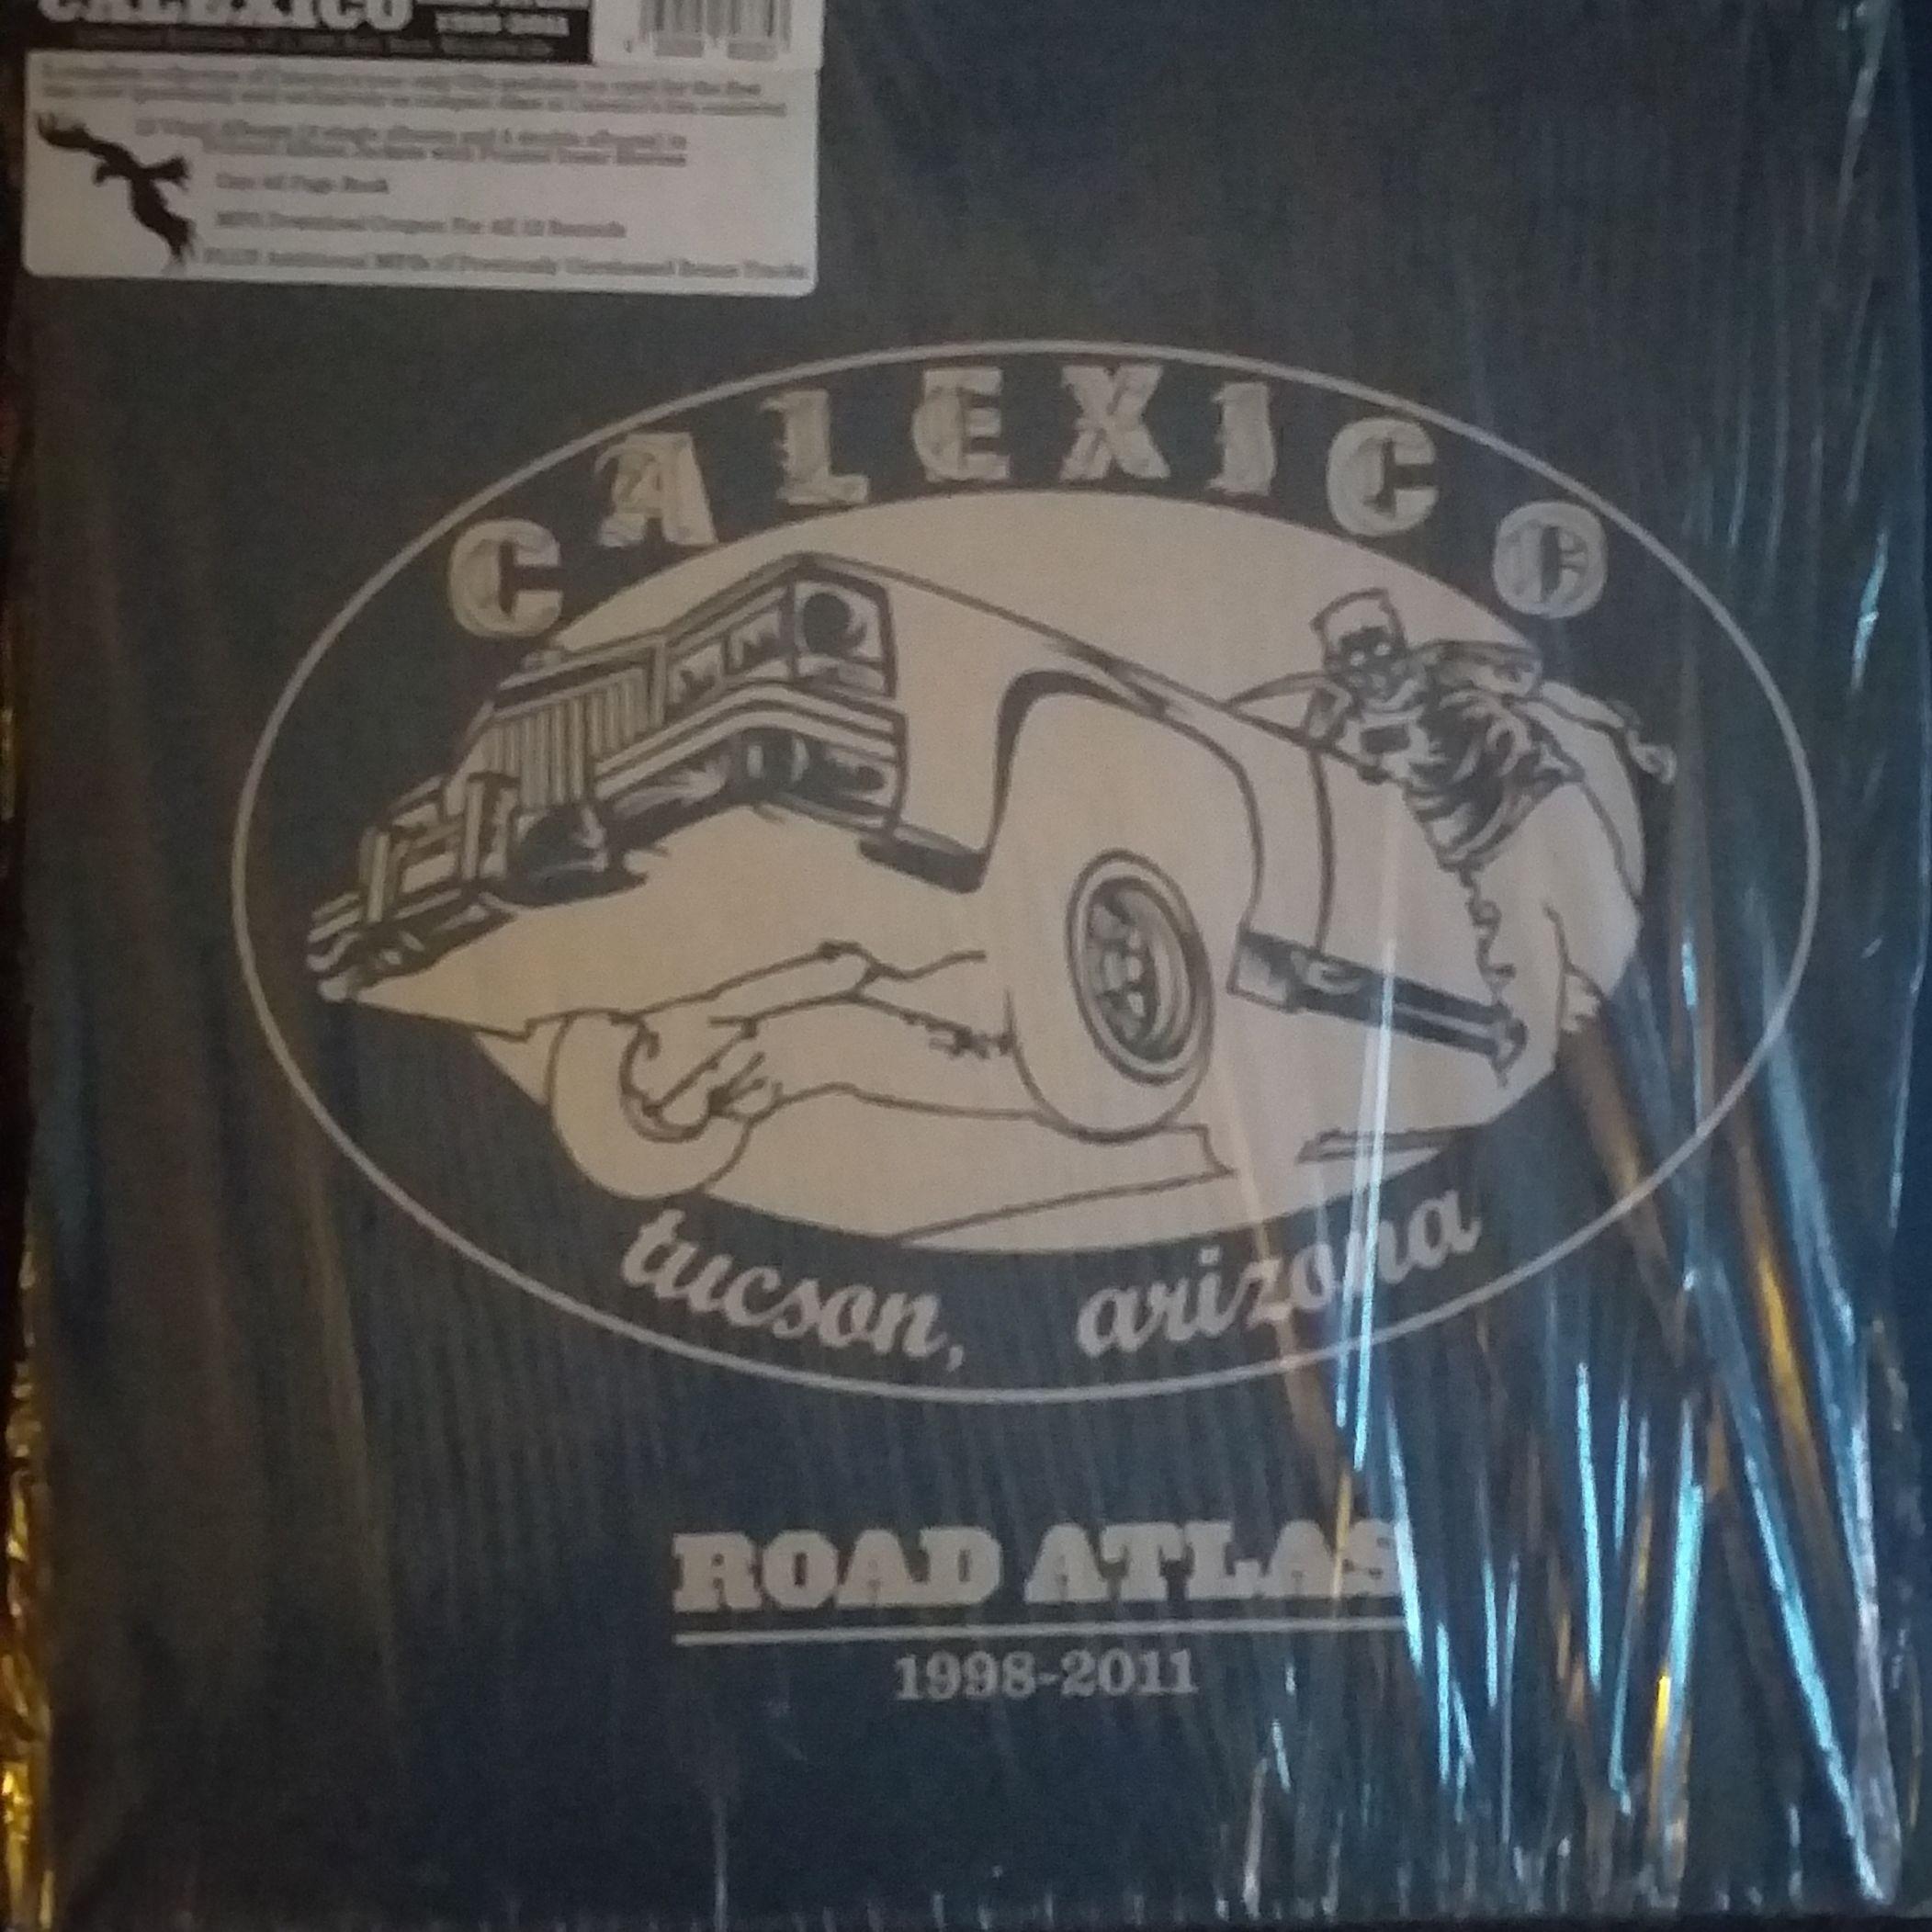 Calexico  Road atlas 1998-2011 LP undefined